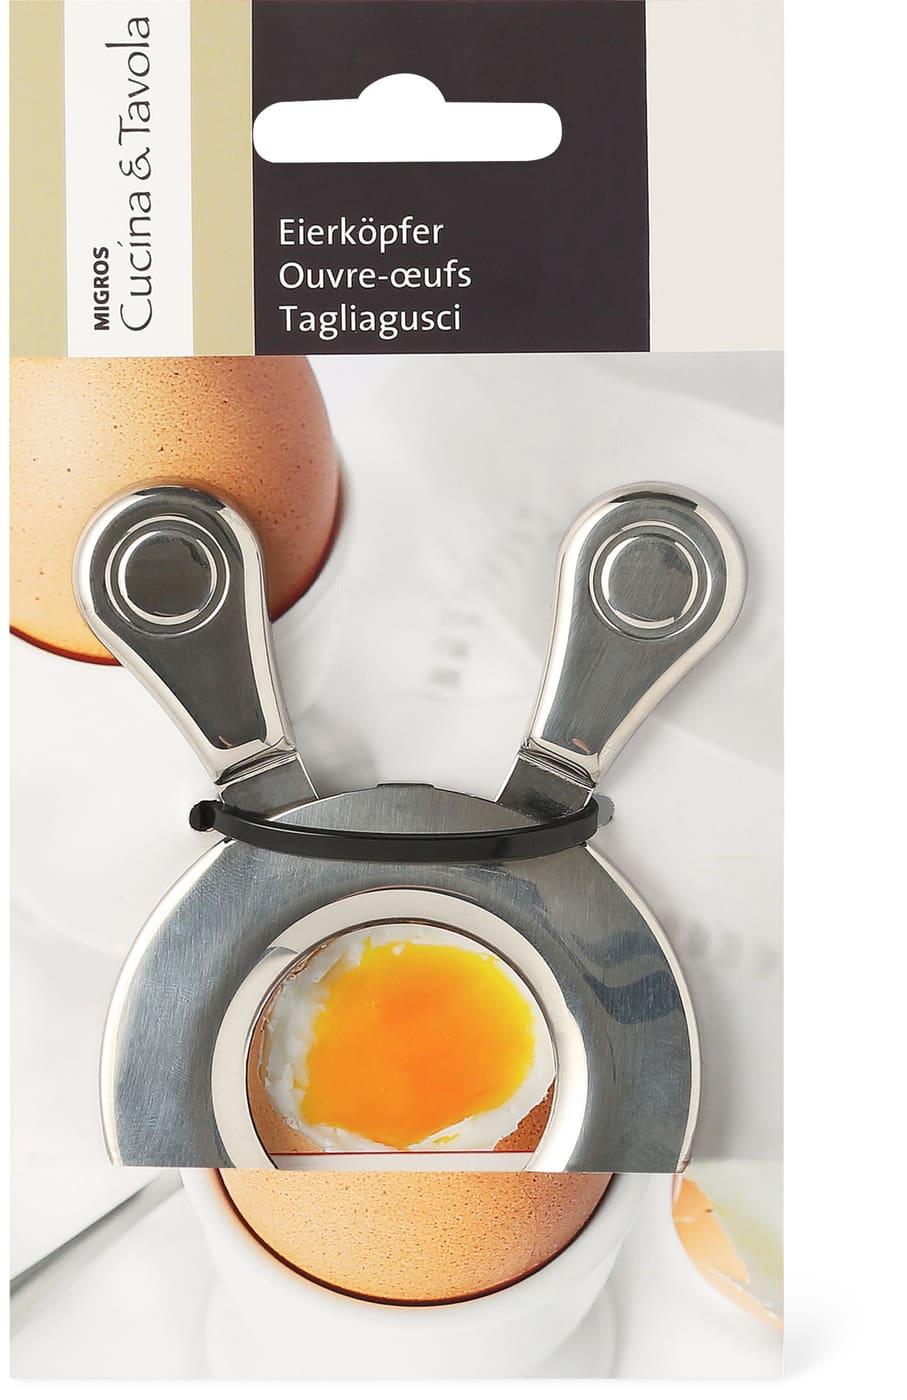 Cucina tavola cucina tavola eierk pfer migros for Tavola cucina